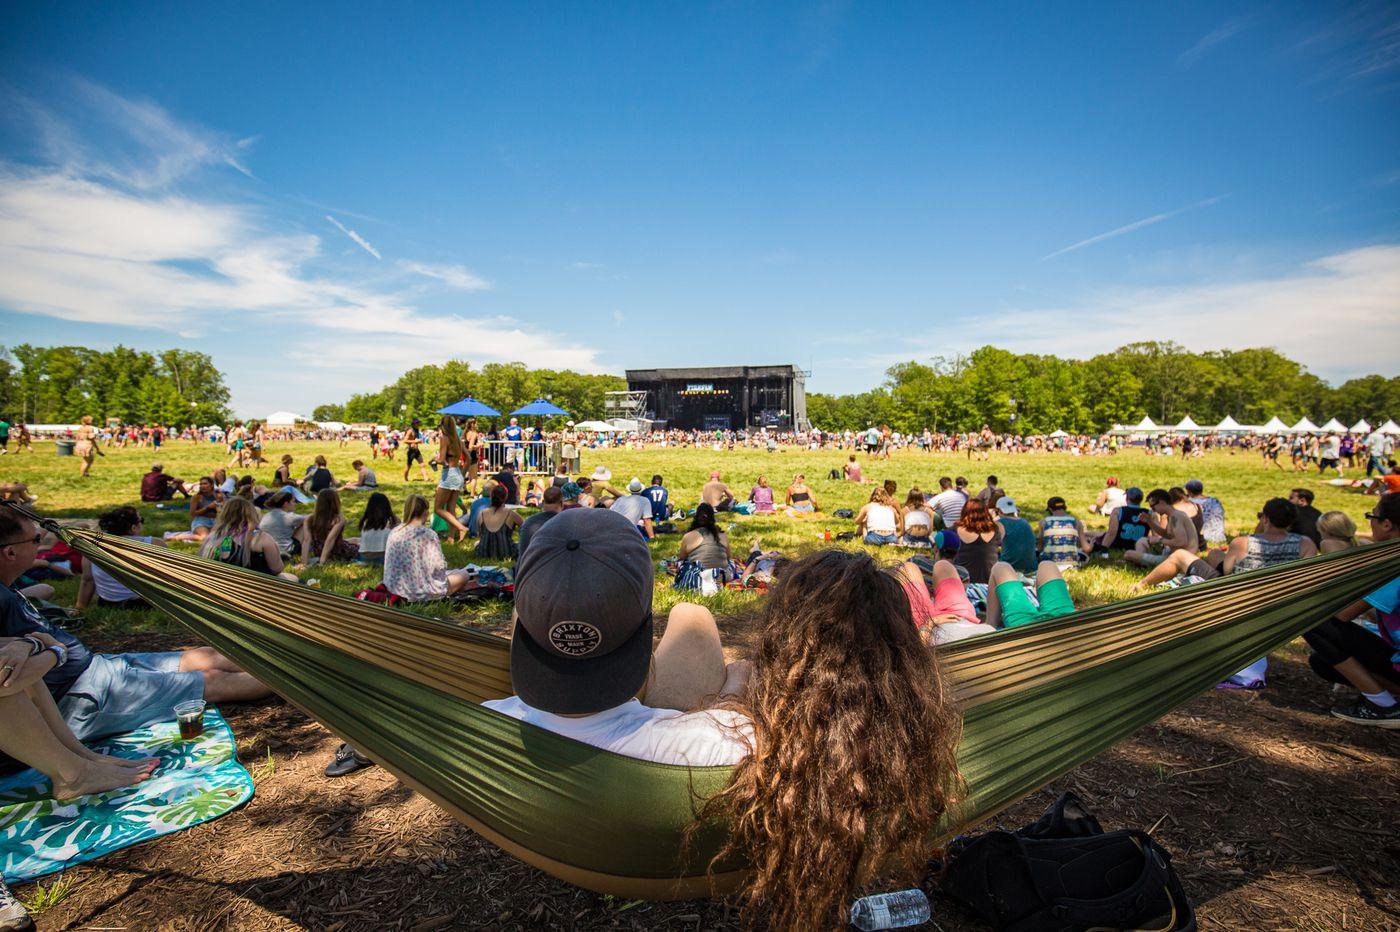 Philadelphia woman, 20, found dead at Firefly Music Festival